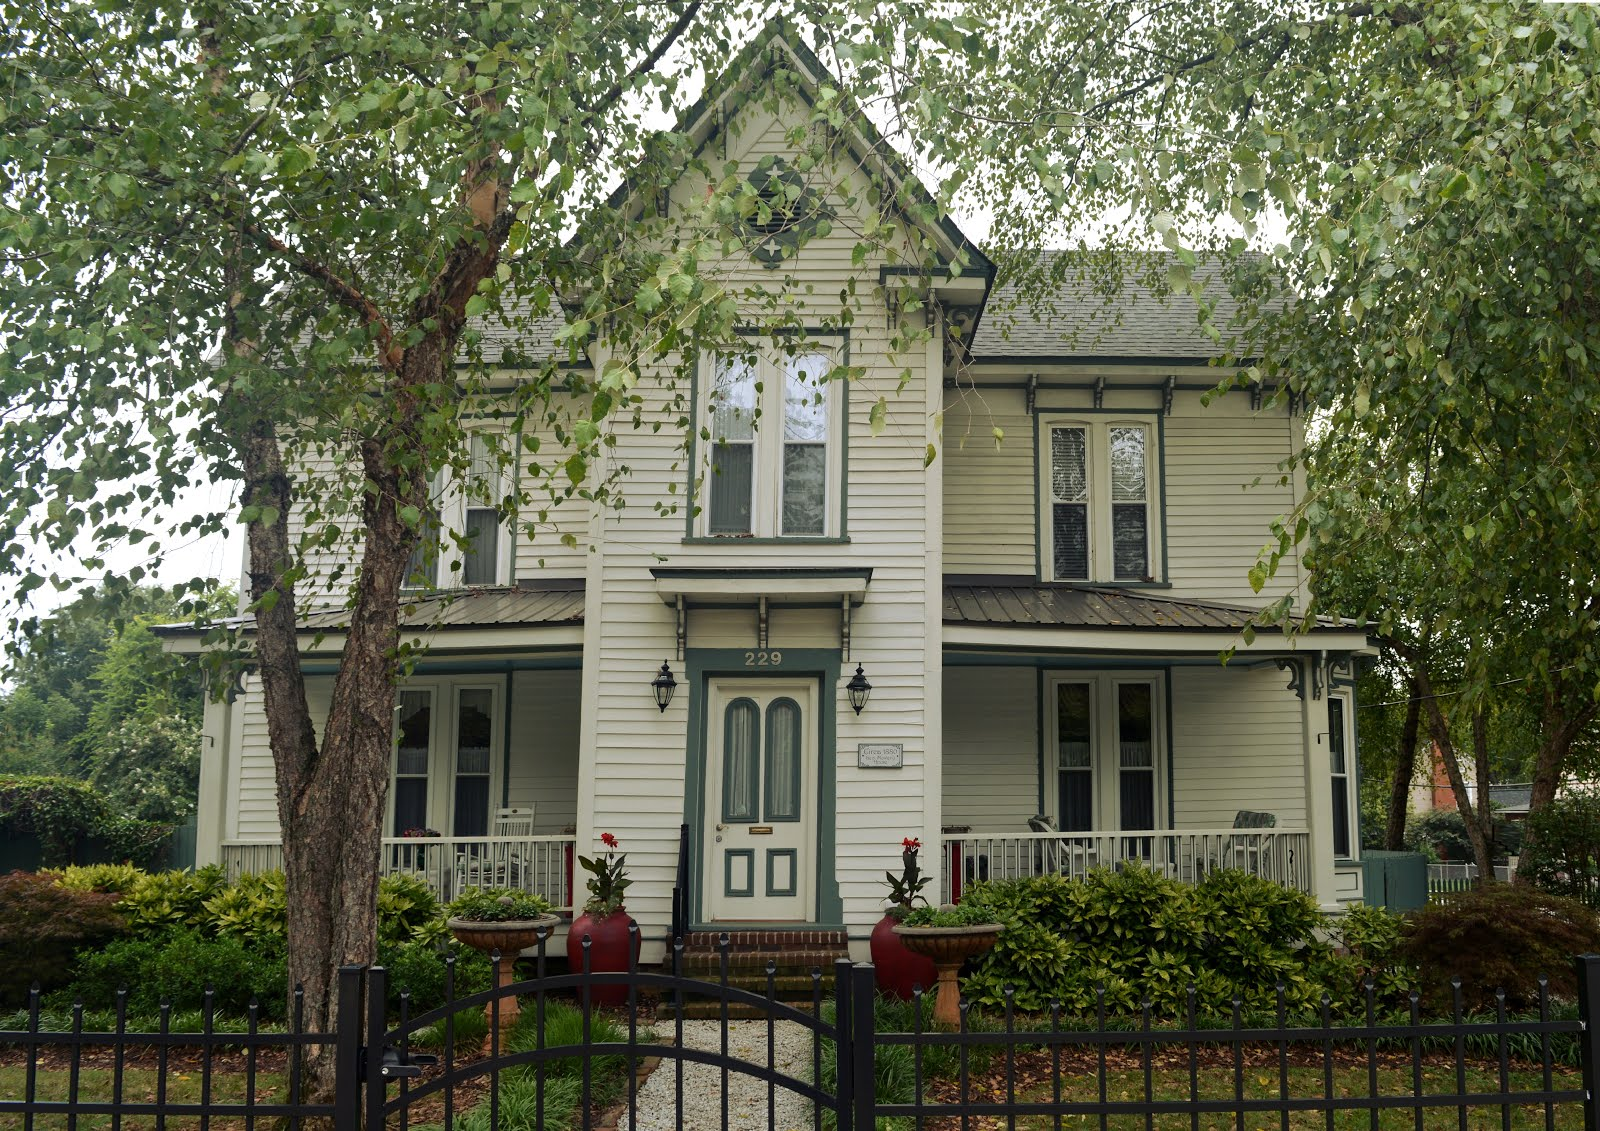 229 S. Long Street, Salisbury NC 28144 ~ Circa 1880 ~ $225,000